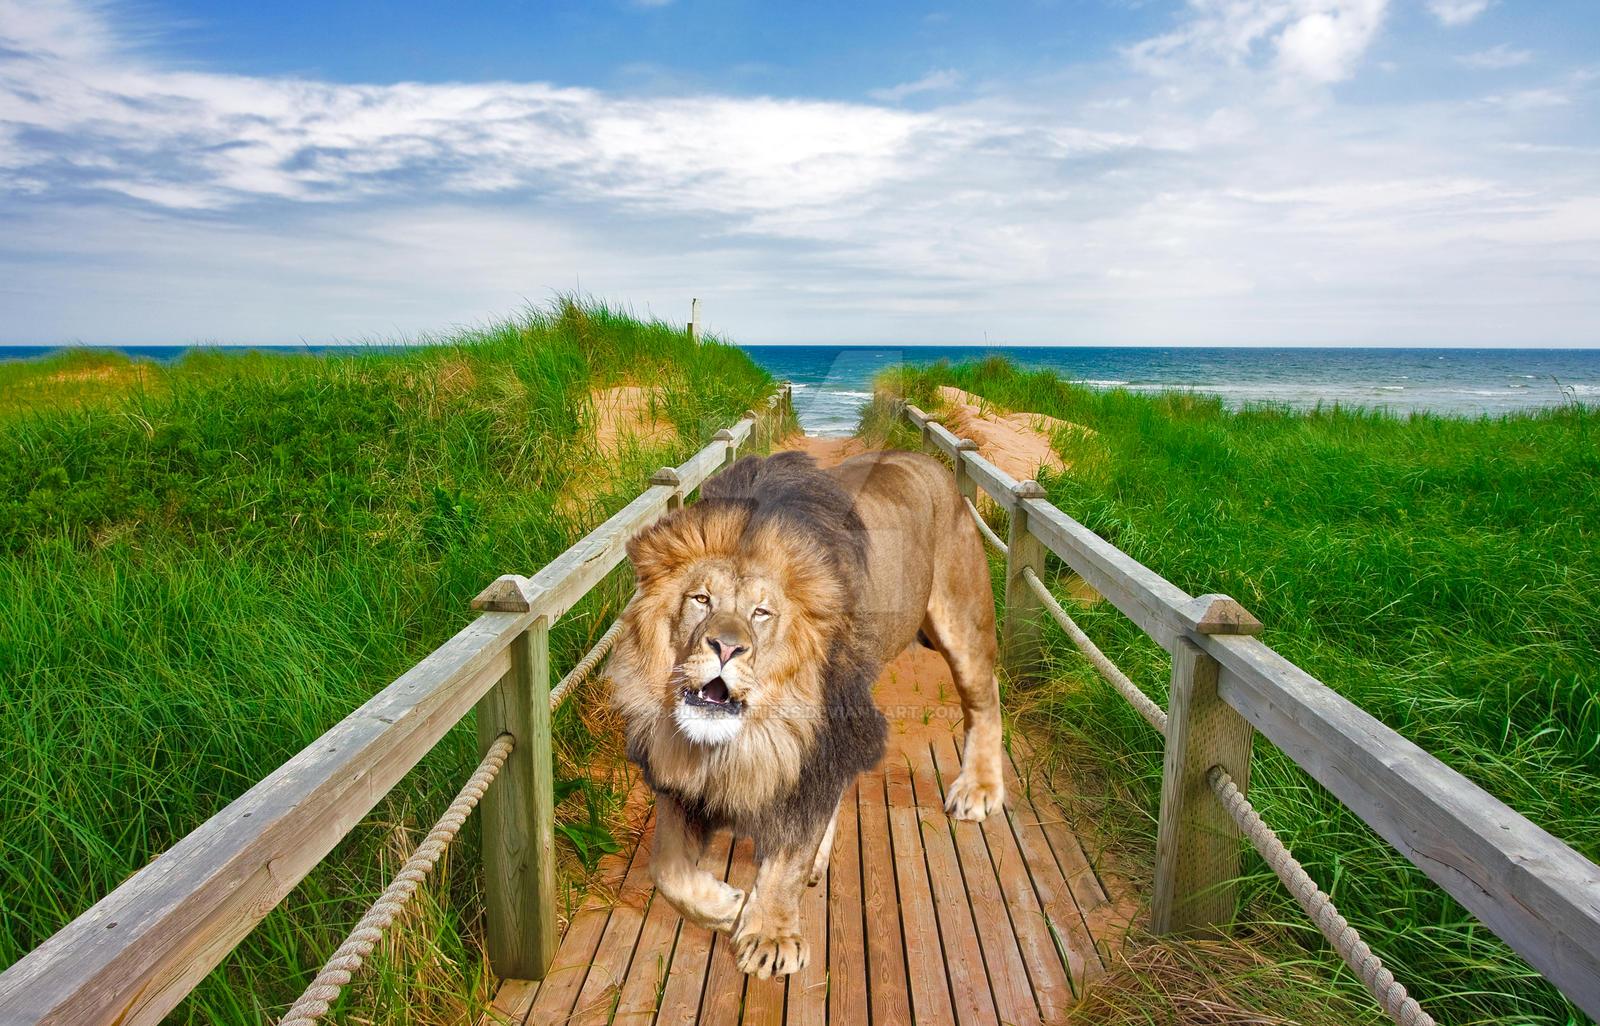 Beach Boardwalk Lion - Exclusive Premade Stock by somadjinn